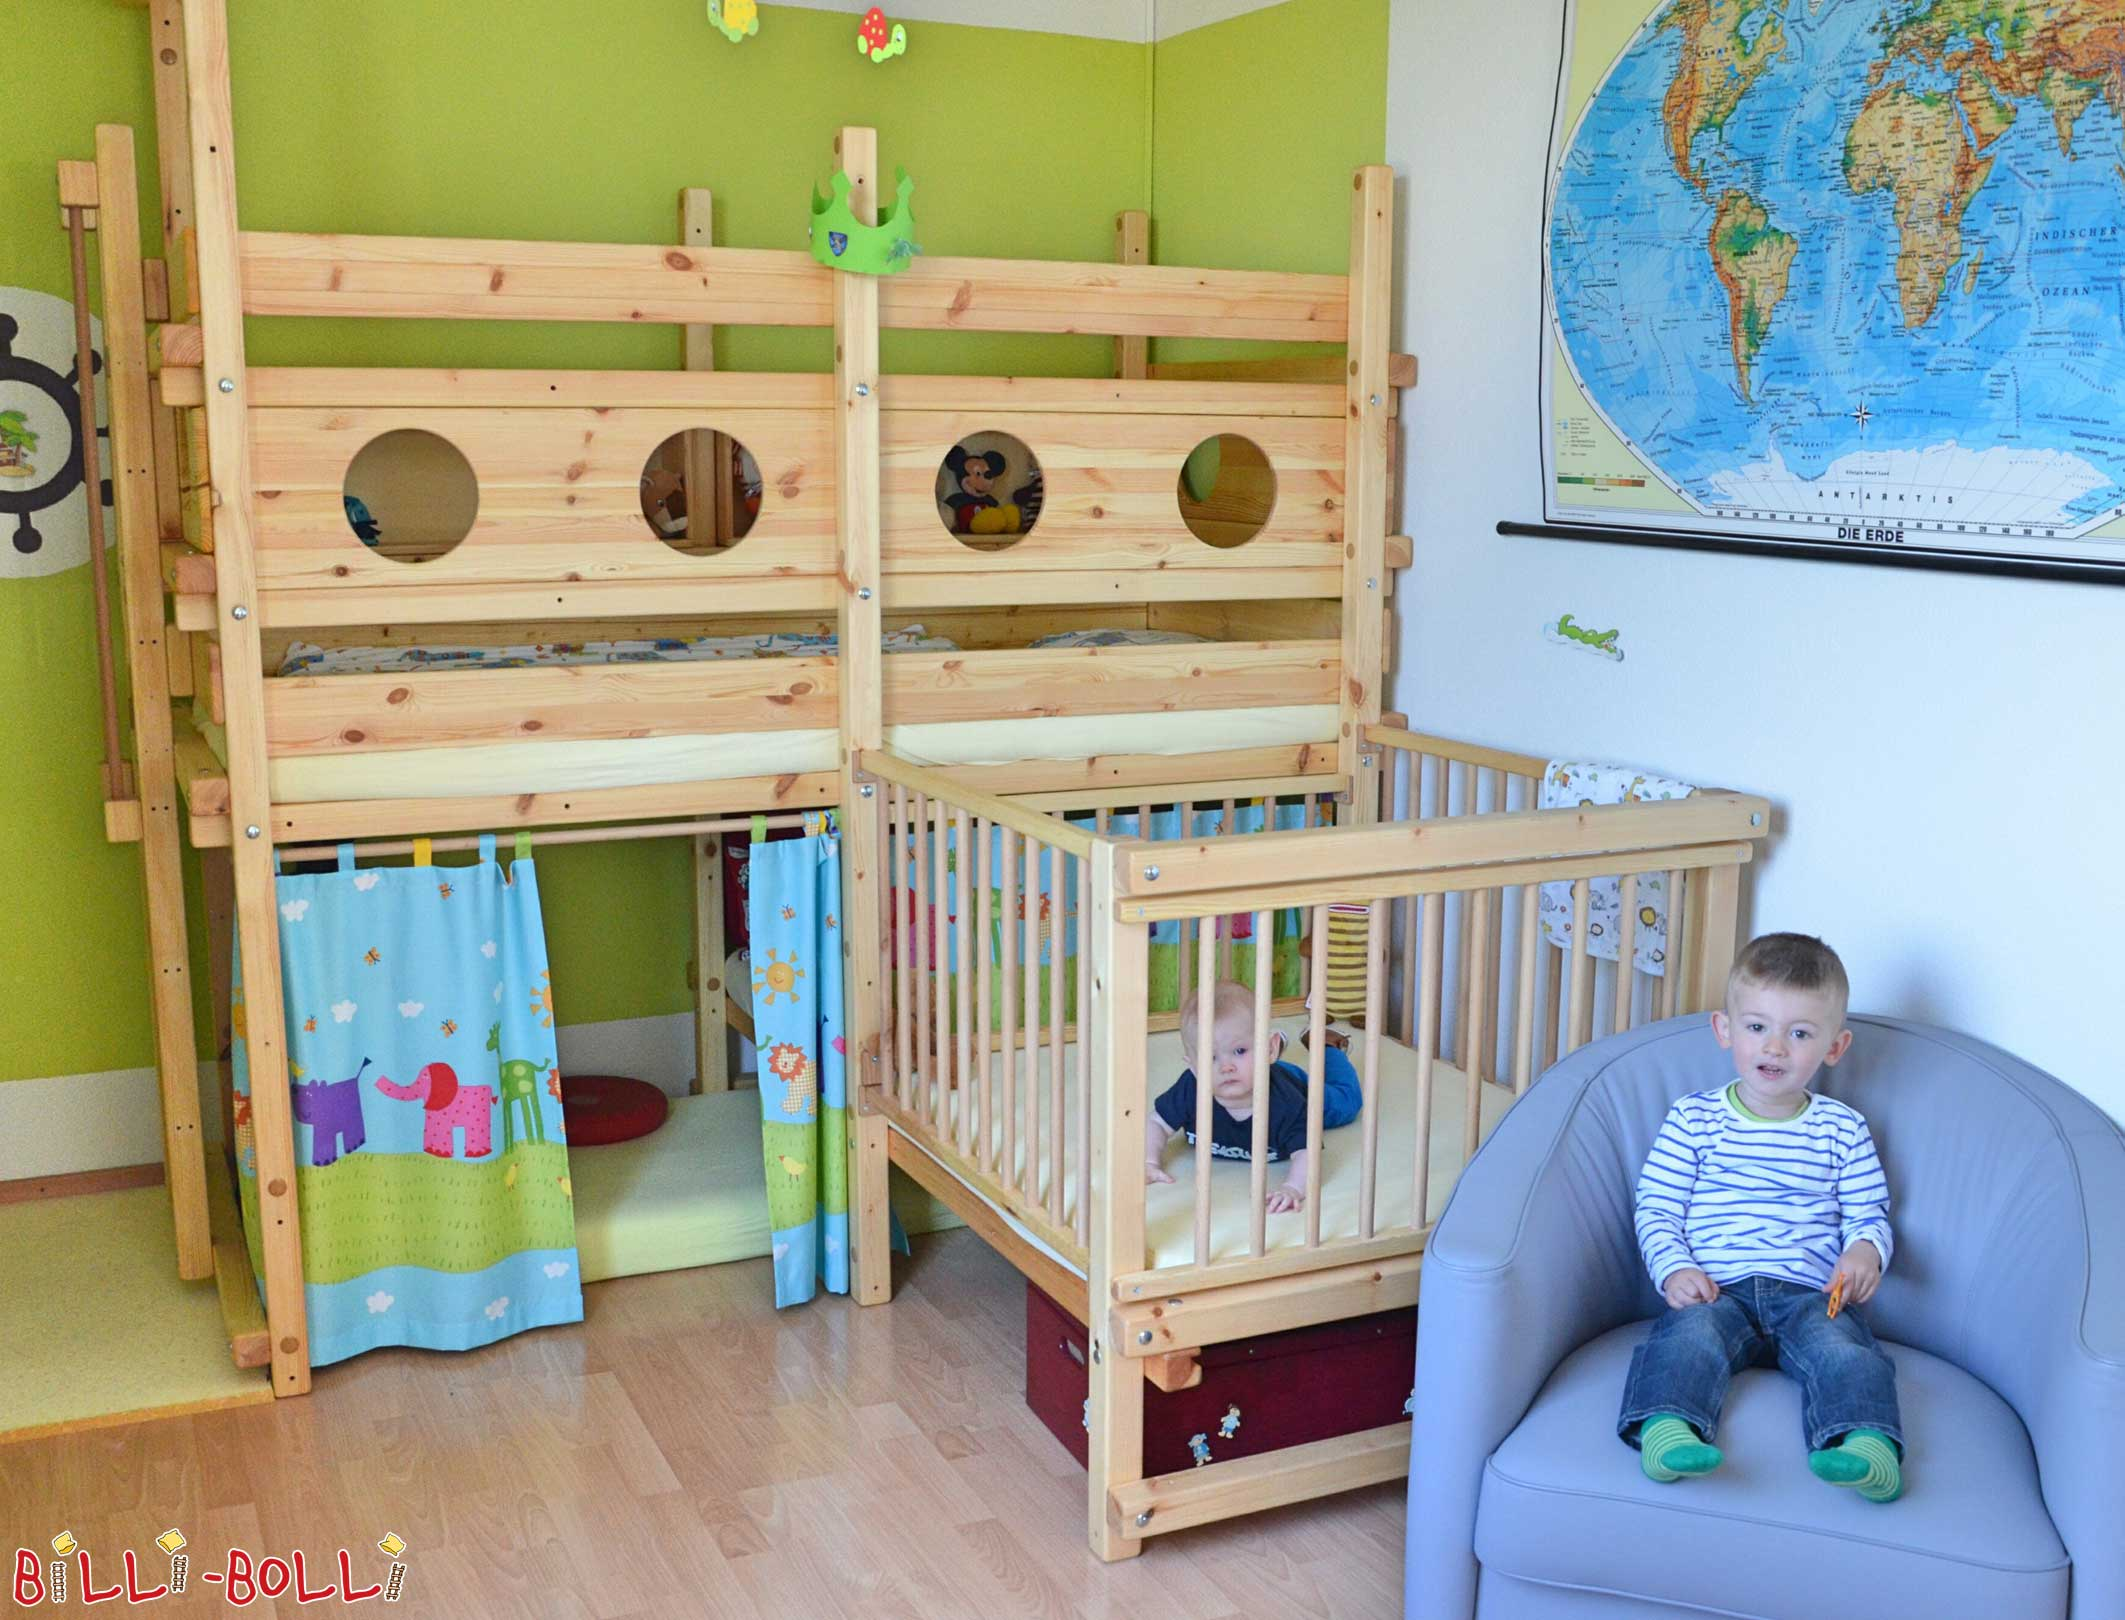 Etagenbett Baby : Etagenbett über eck billi bolli kindermöbel